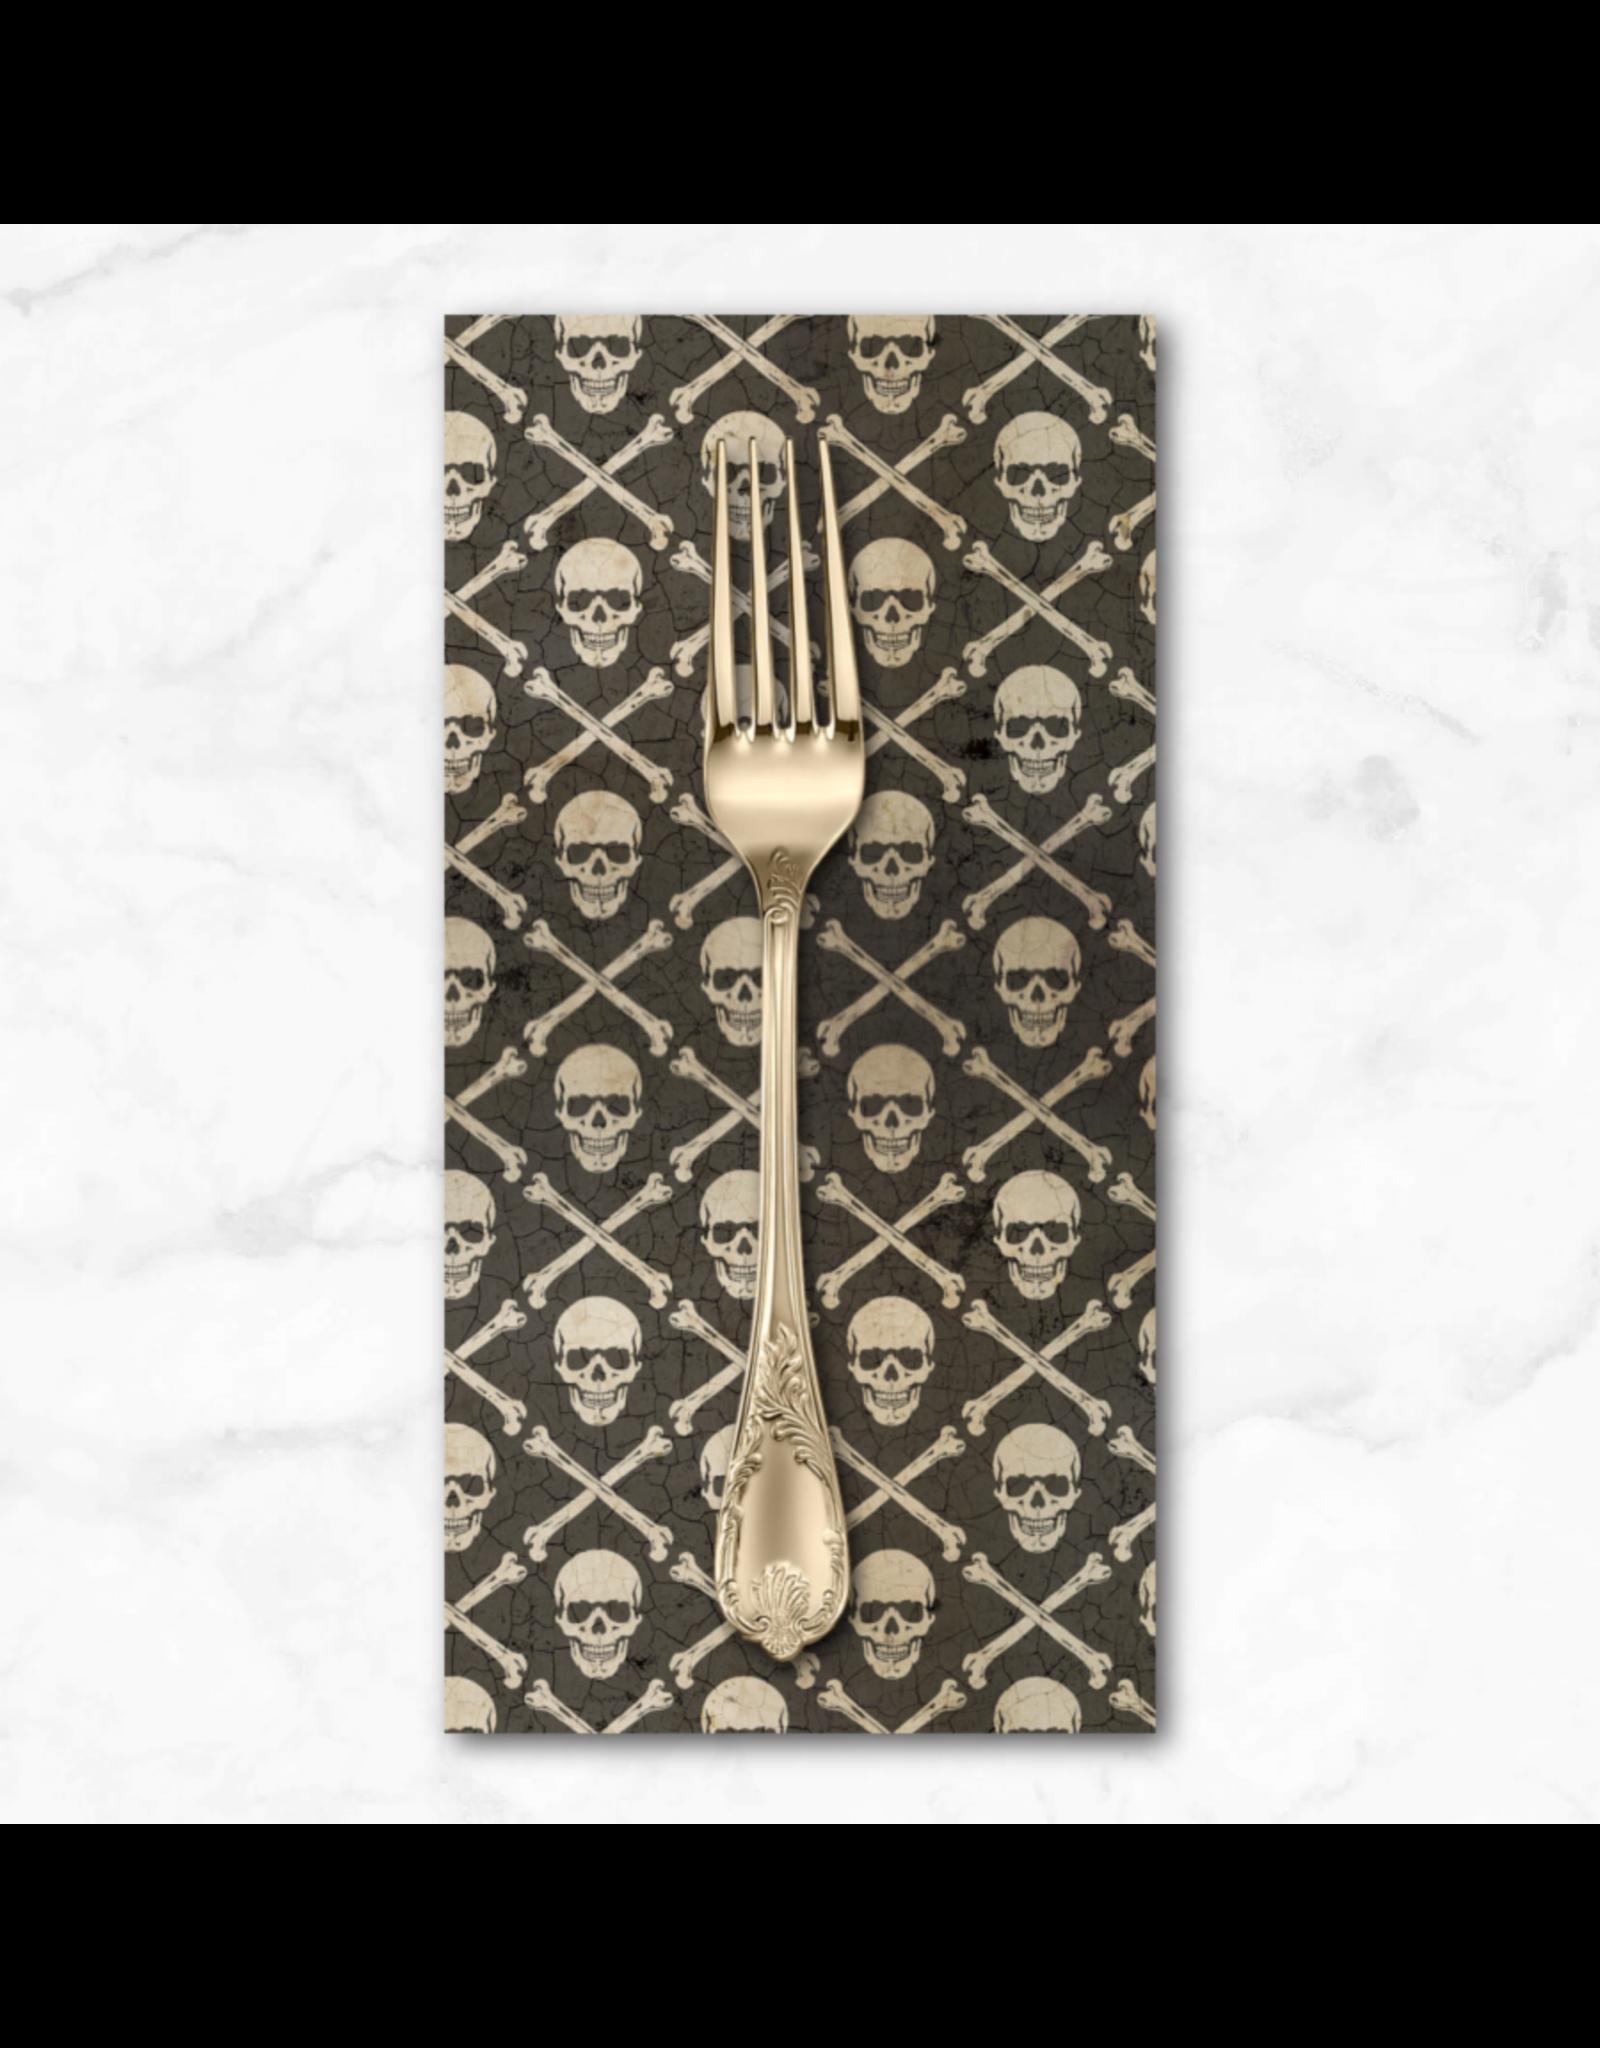 PD's Tim Holtz Collection Regions Beyond, Crossbones in Black, Dinner Napkin